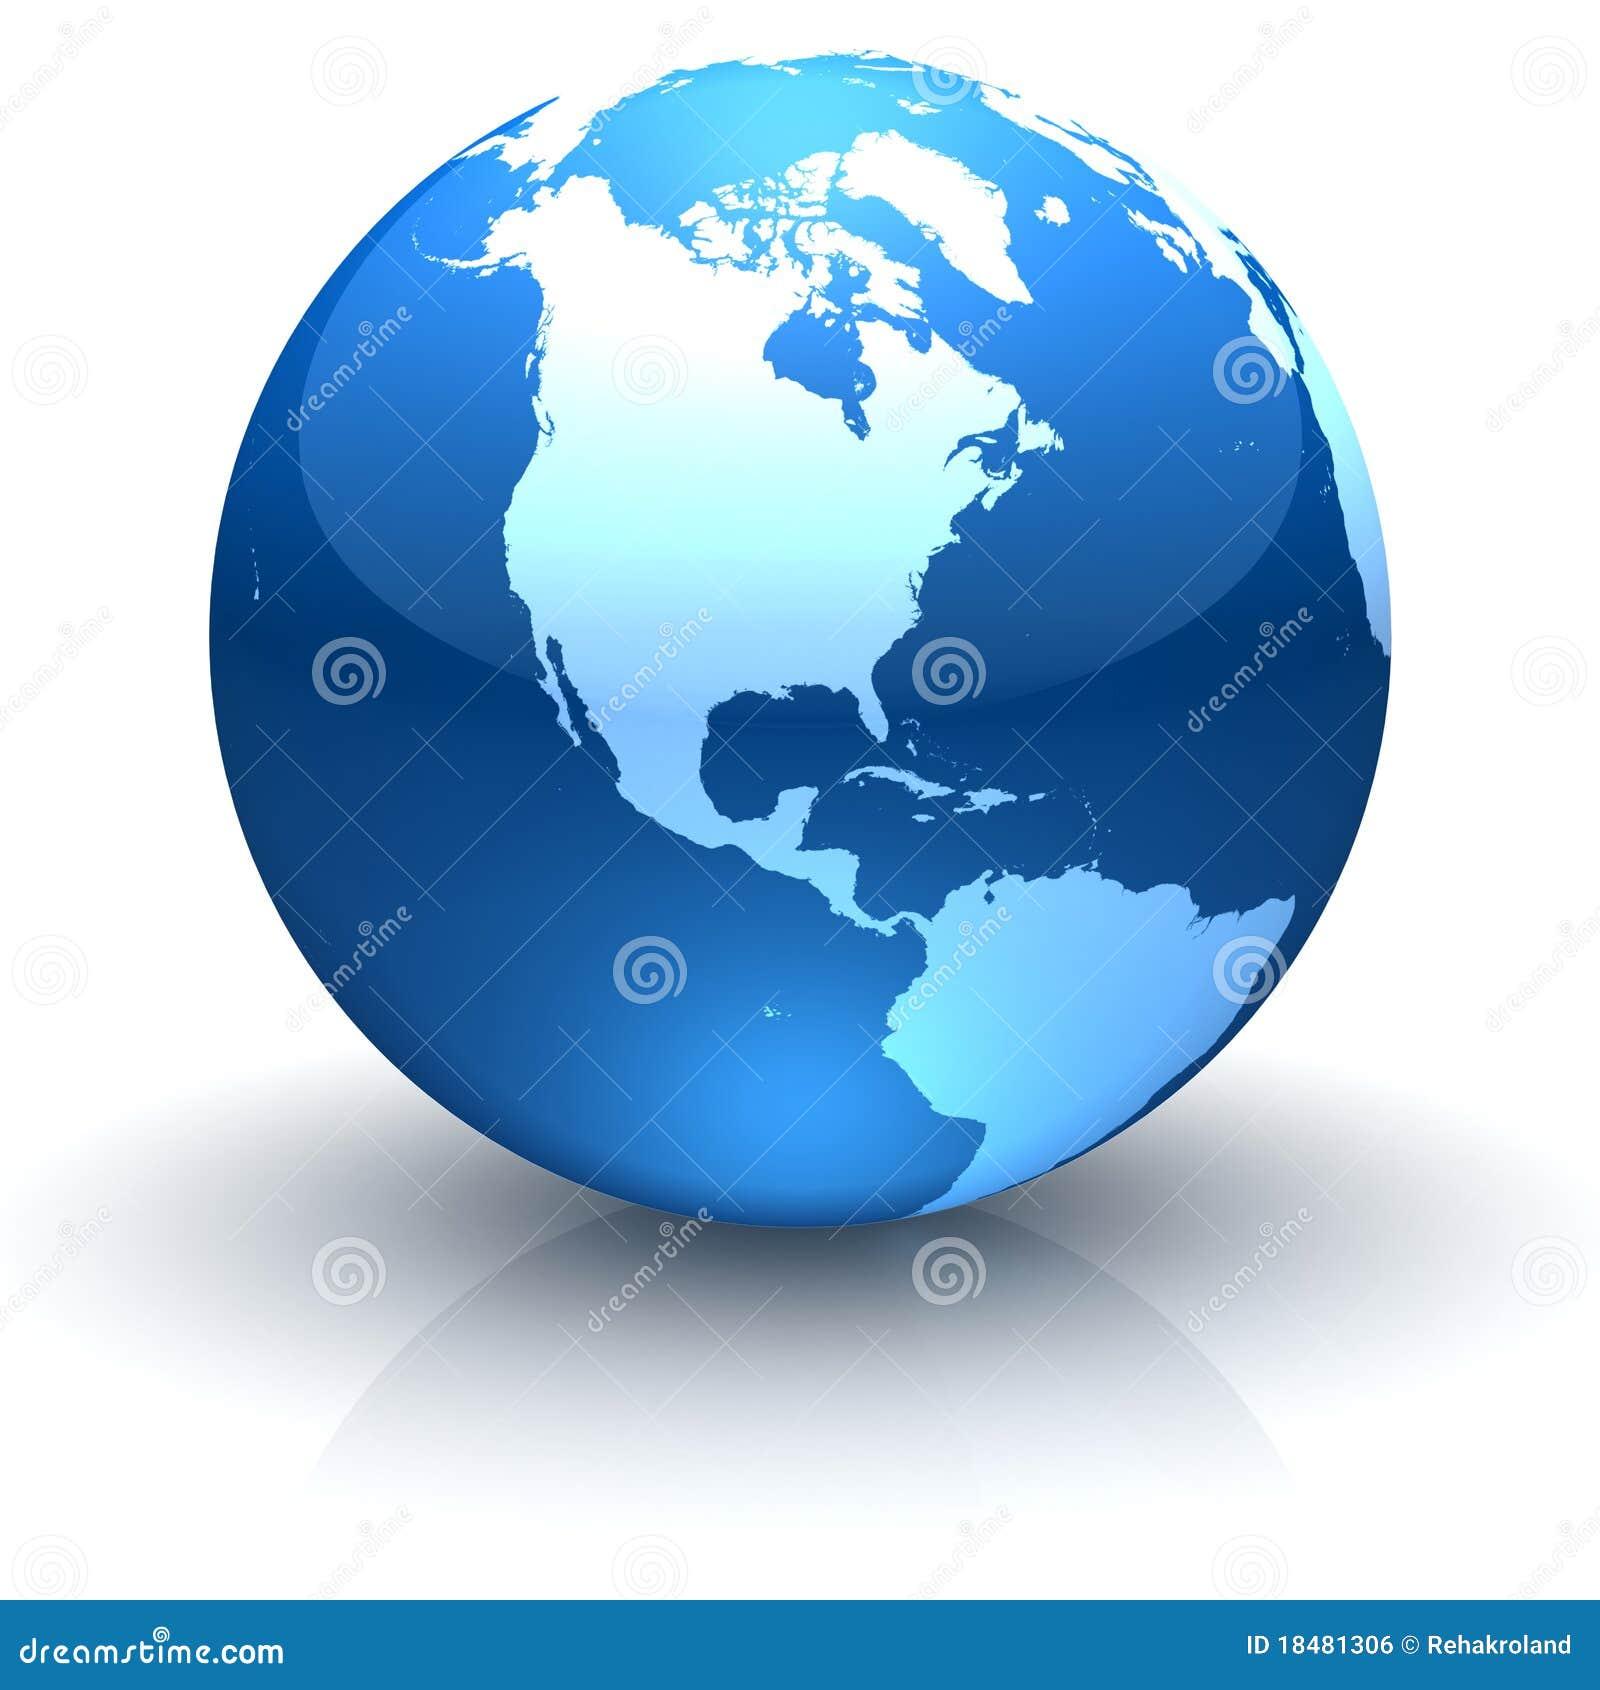 Glanzende blauwe bol die Noord-Amerika onder ogen ziet